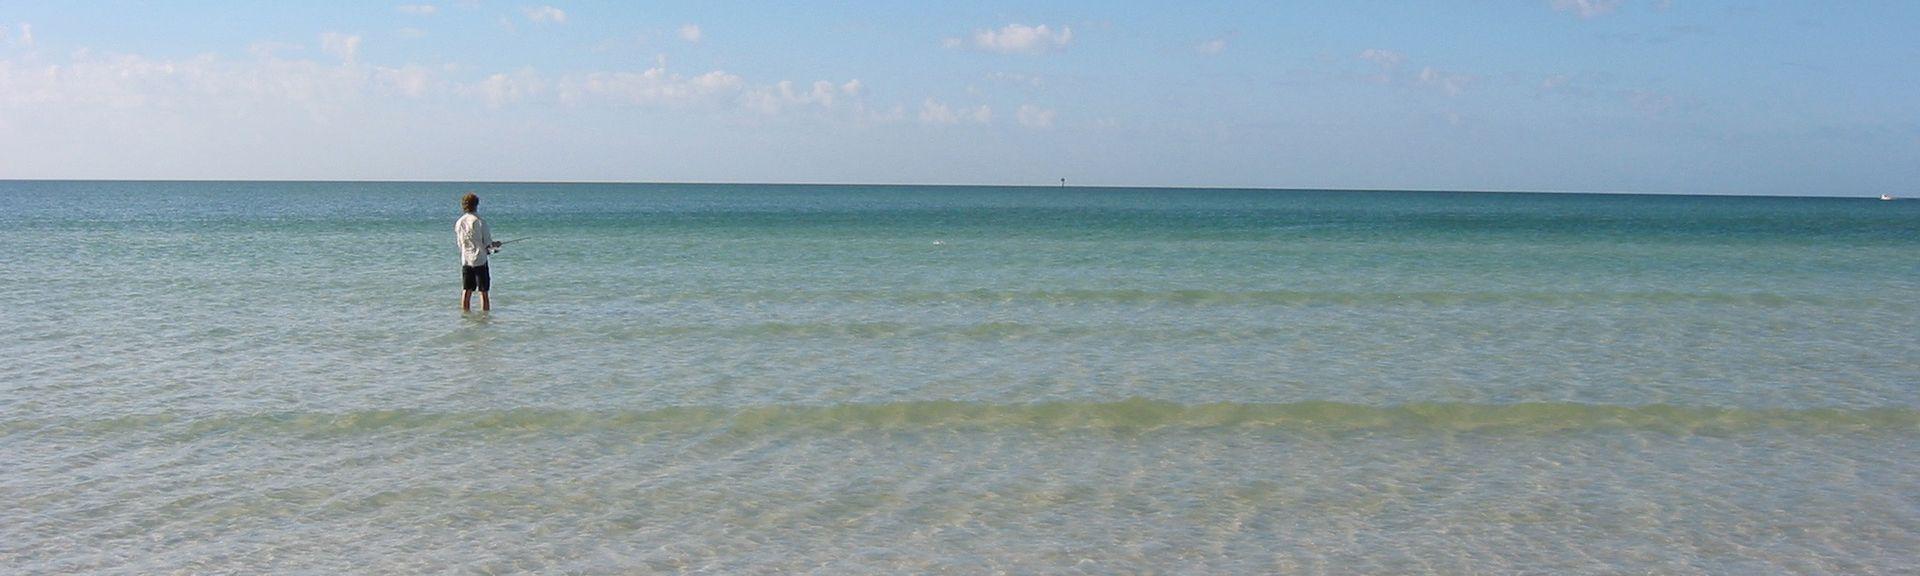 Palm Island, Siesta Key, FL, USA